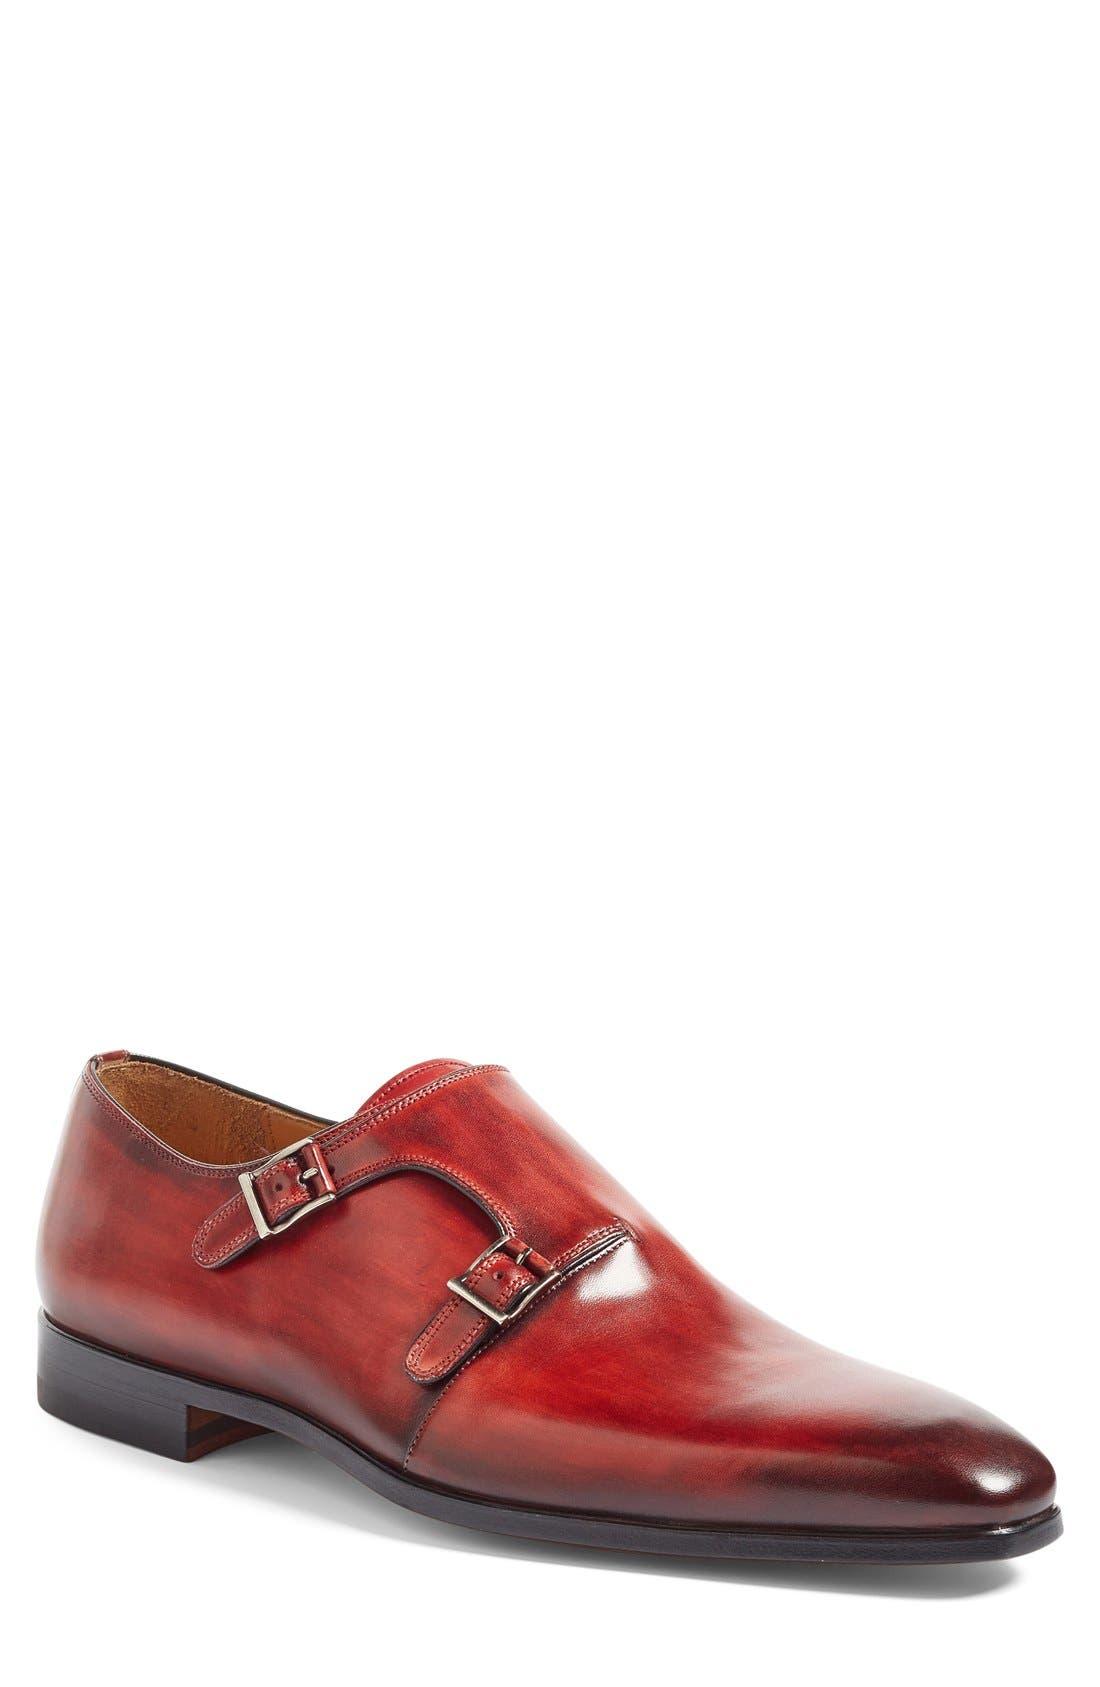 Jamin Double Monk Strap Shoe,                             Main thumbnail 2, color,